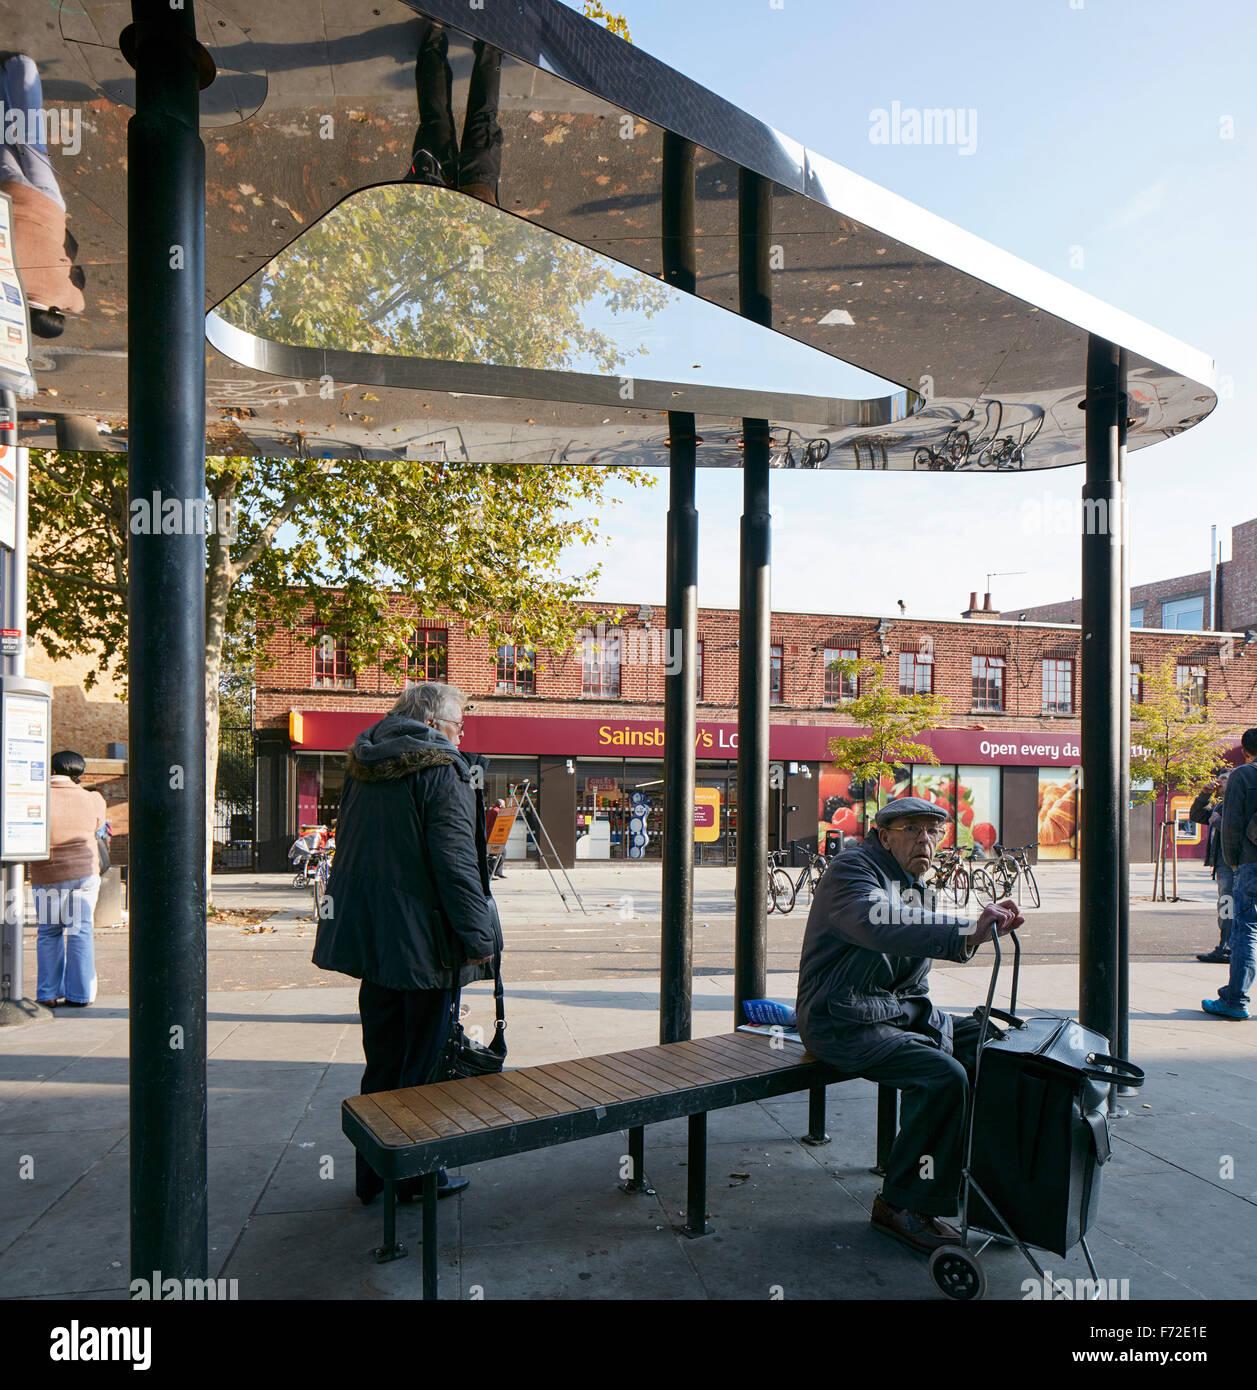 Bus shelter with senior citizen waiting. Binfield Road Bus Shelter, Stockwell Framework Masterplan, London, United - Stock Image